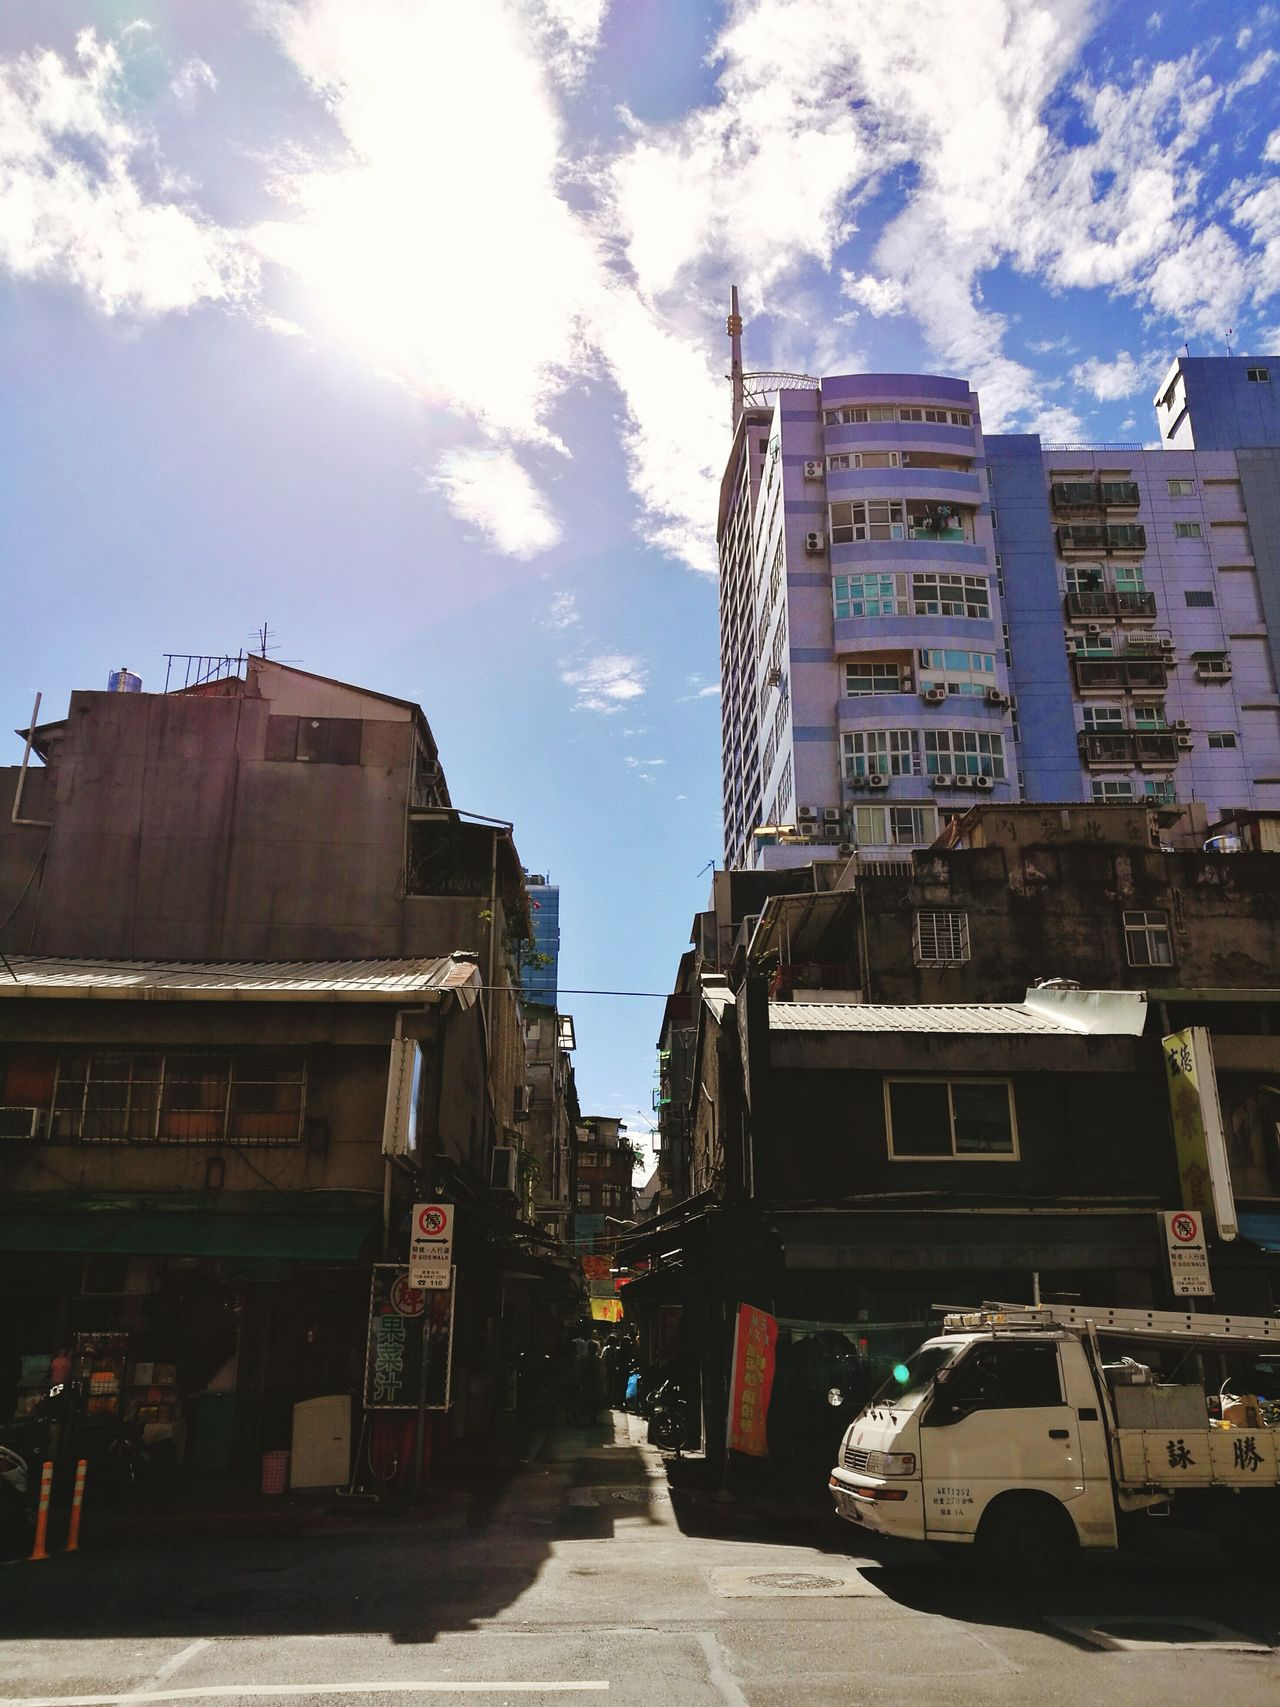 Street photography City Travel Destinations History Architecture Outdoors Cityscape No People Sky Day Taipei Taipei,Taiwan Taipeistreet Urban Exploration Street Photography The Architect - 2017 EyeEm Awards